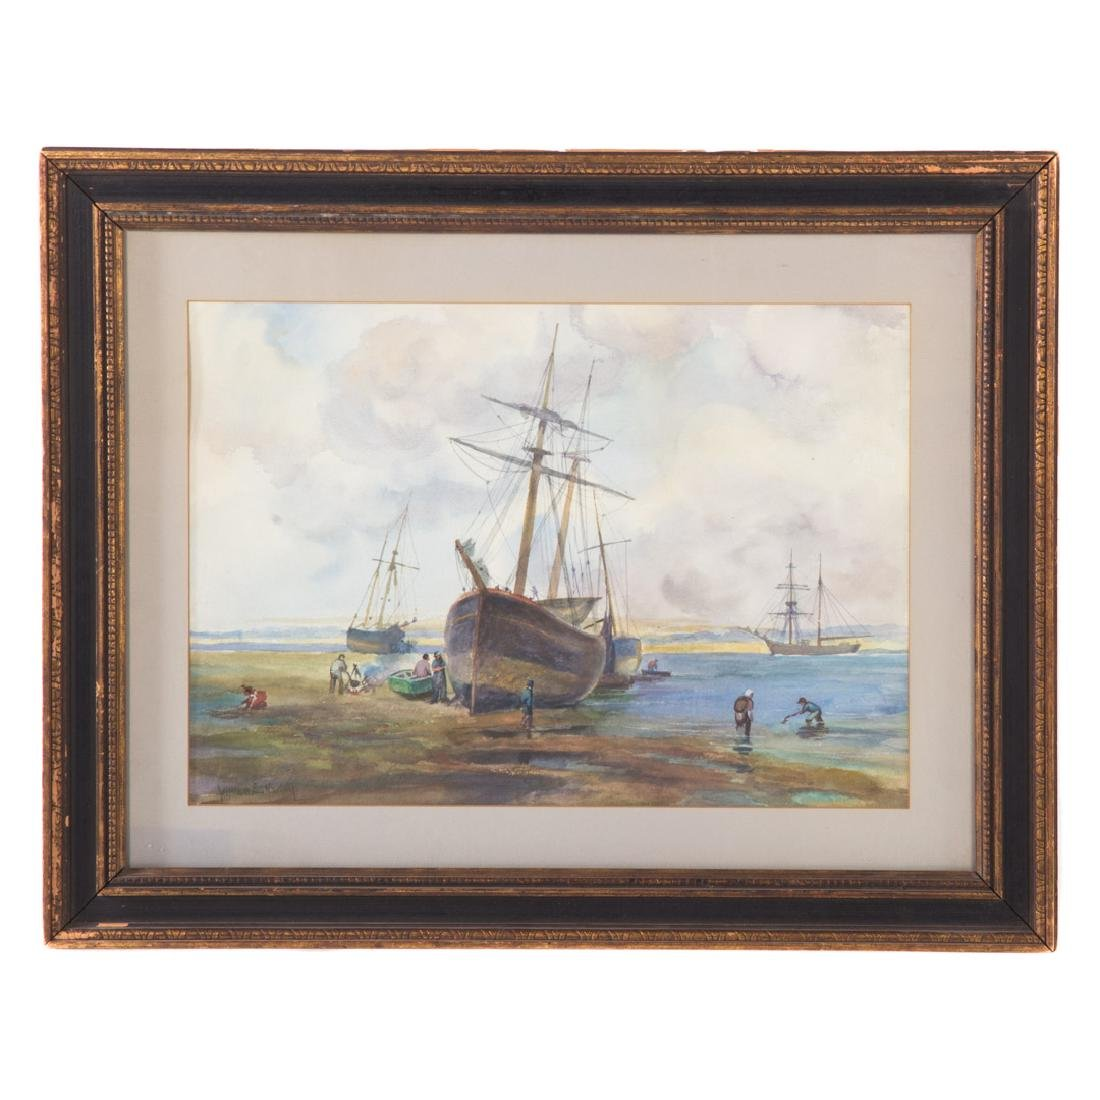 William Norton. Boats at Low Tide, watercolor